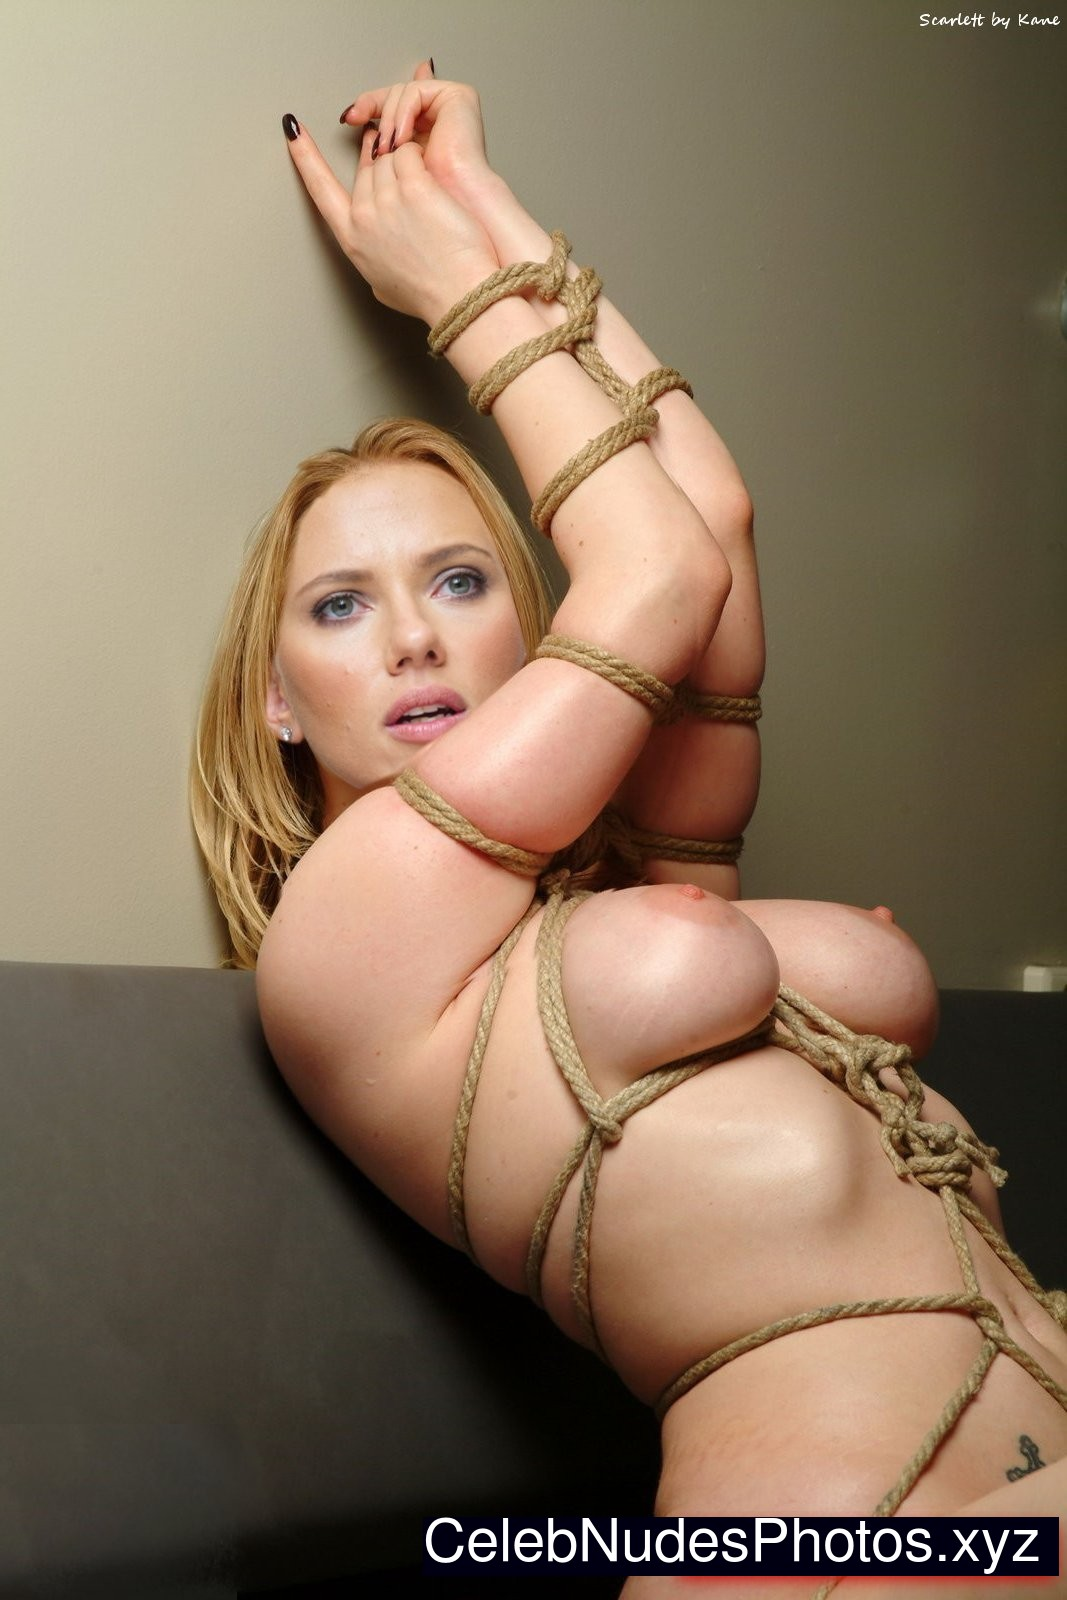 scarlett johanson nude for peta